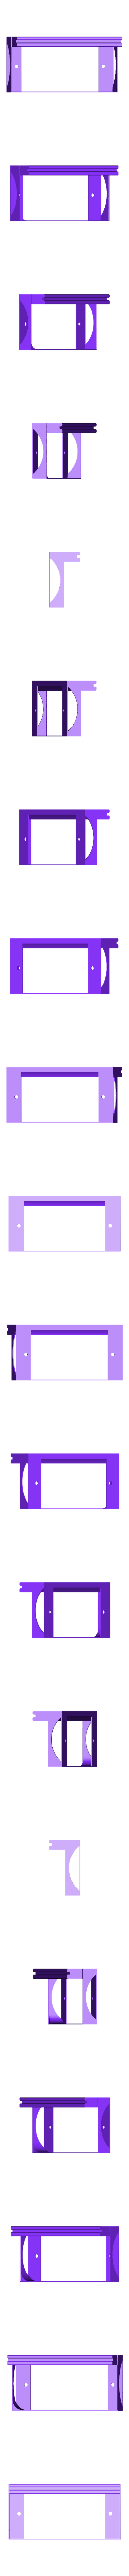 Filamentcontainer_Stand.stl Télécharger fichier STL gratuit Stand de filamentcontainer • Design imprimable en 3D, jennifersirtl